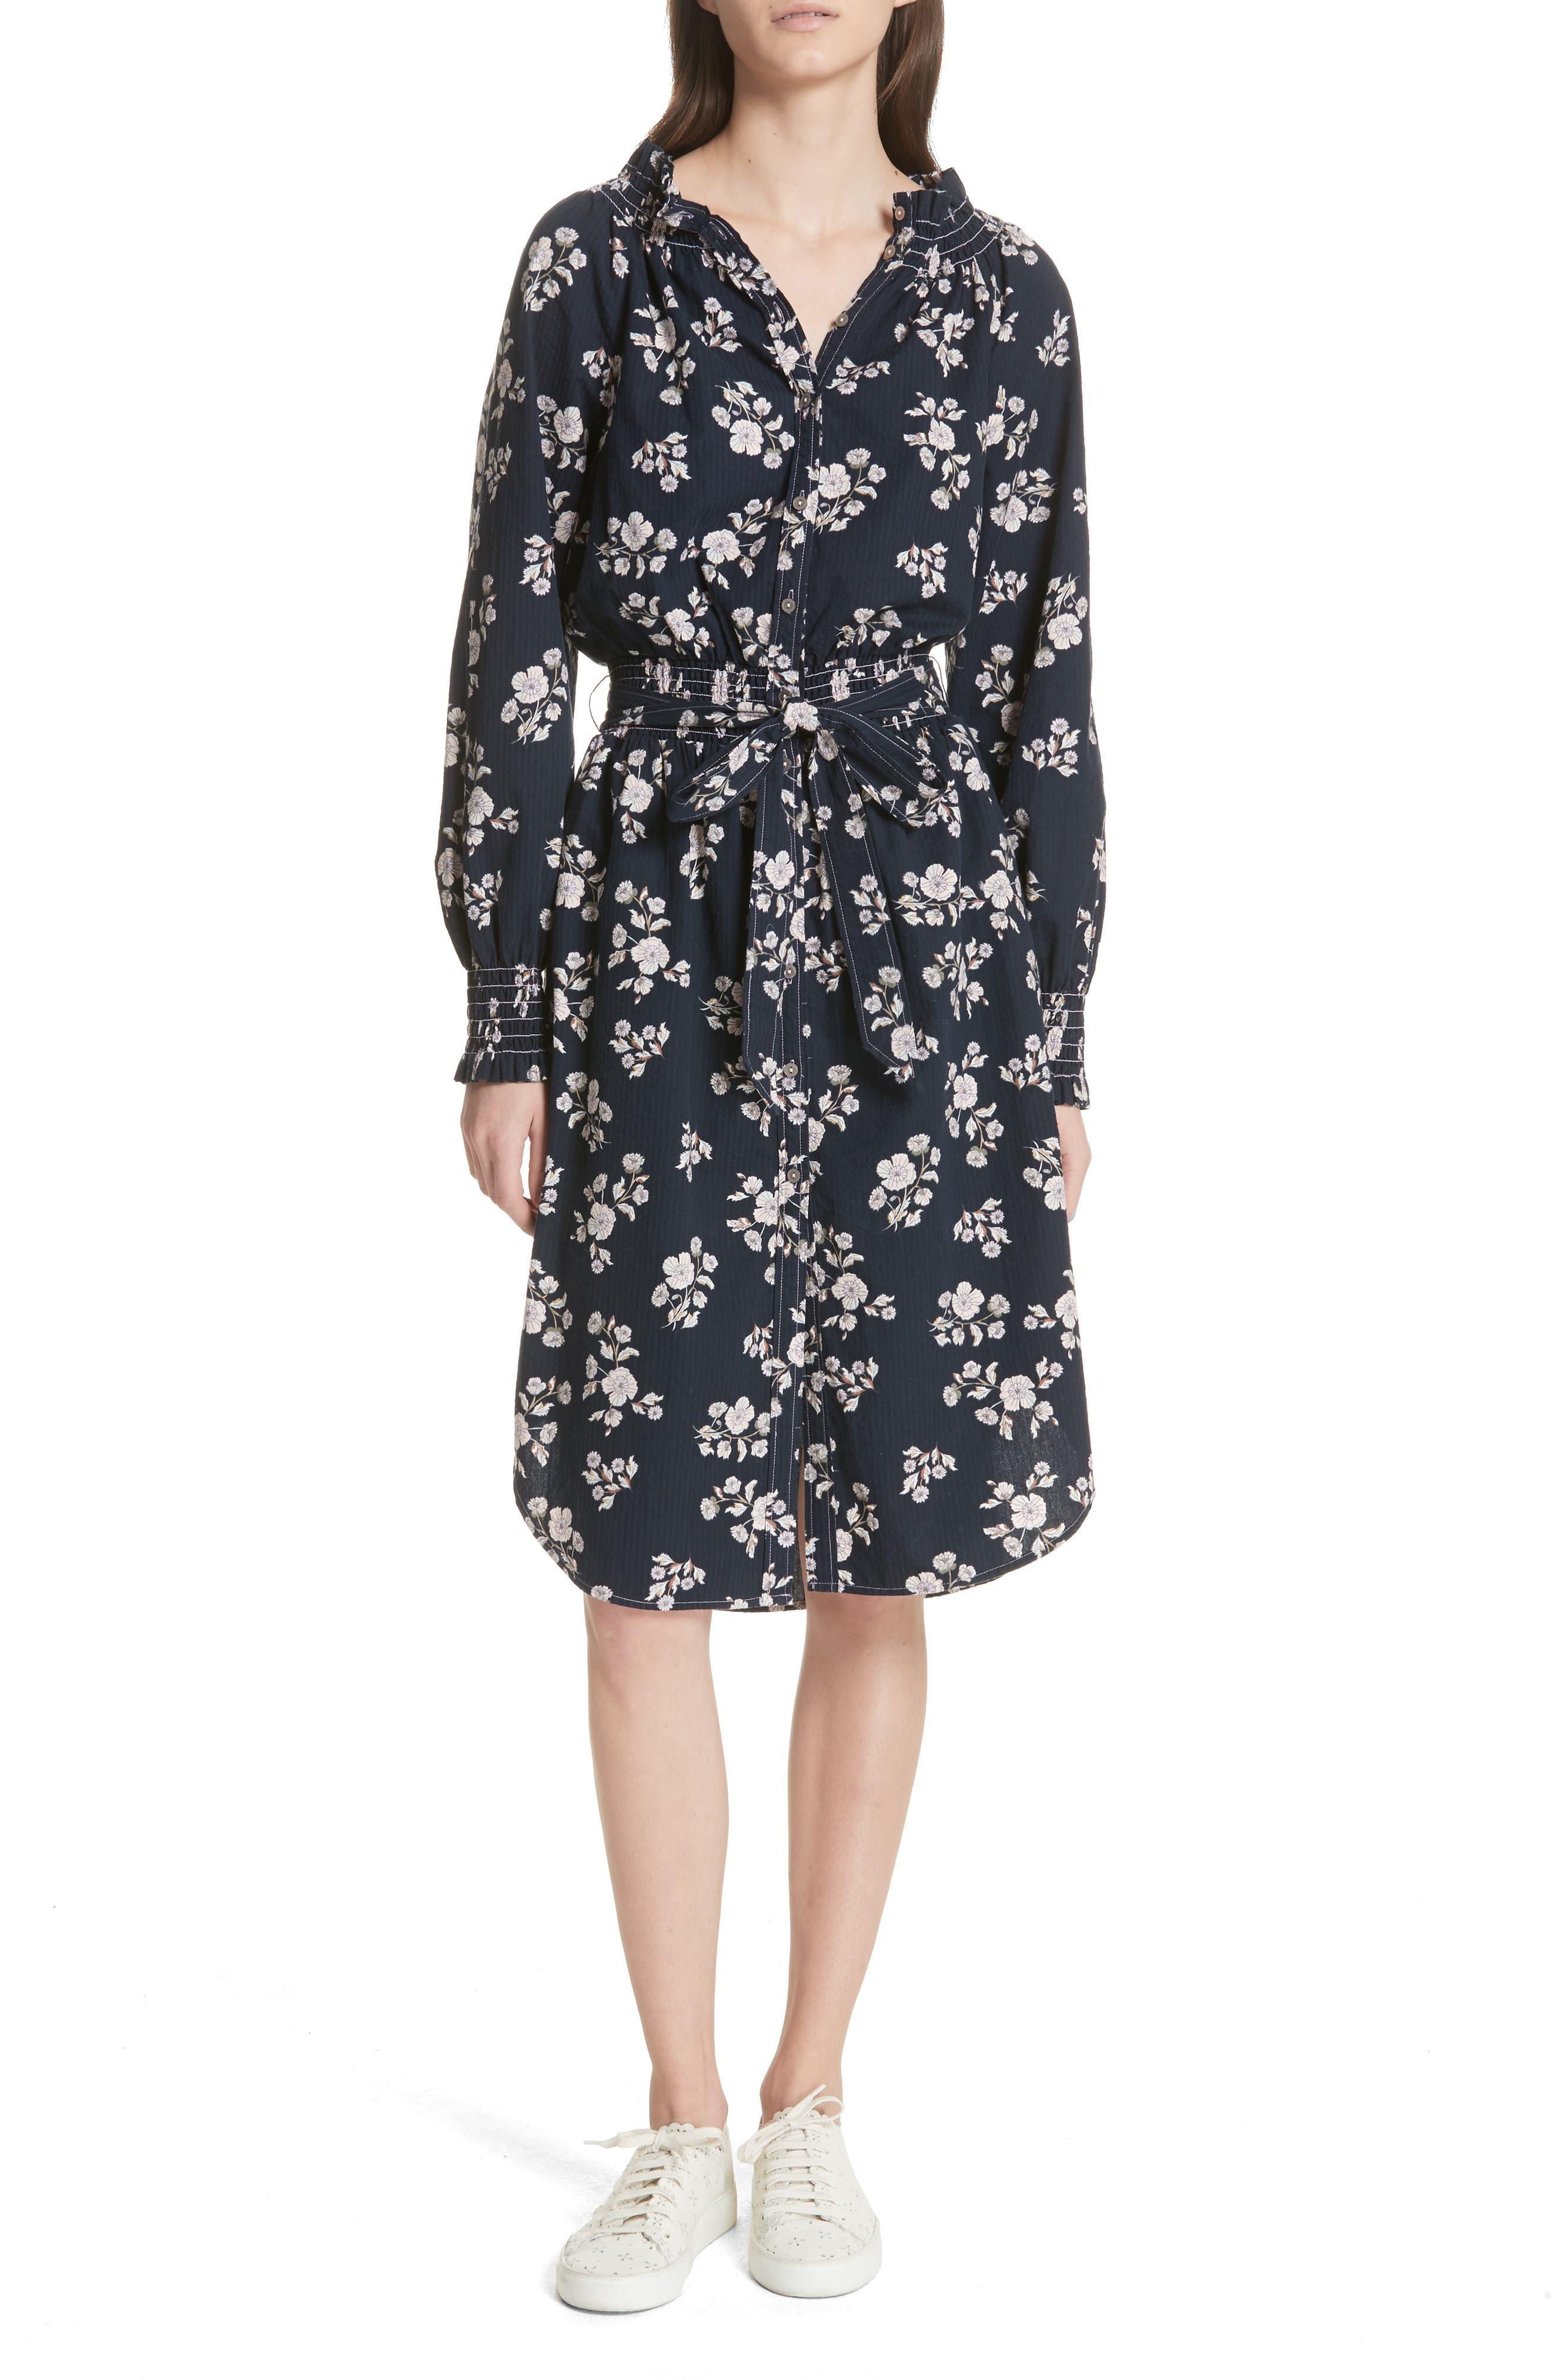 La Vie Rebecca Taylor Camille Floral Shirtdress